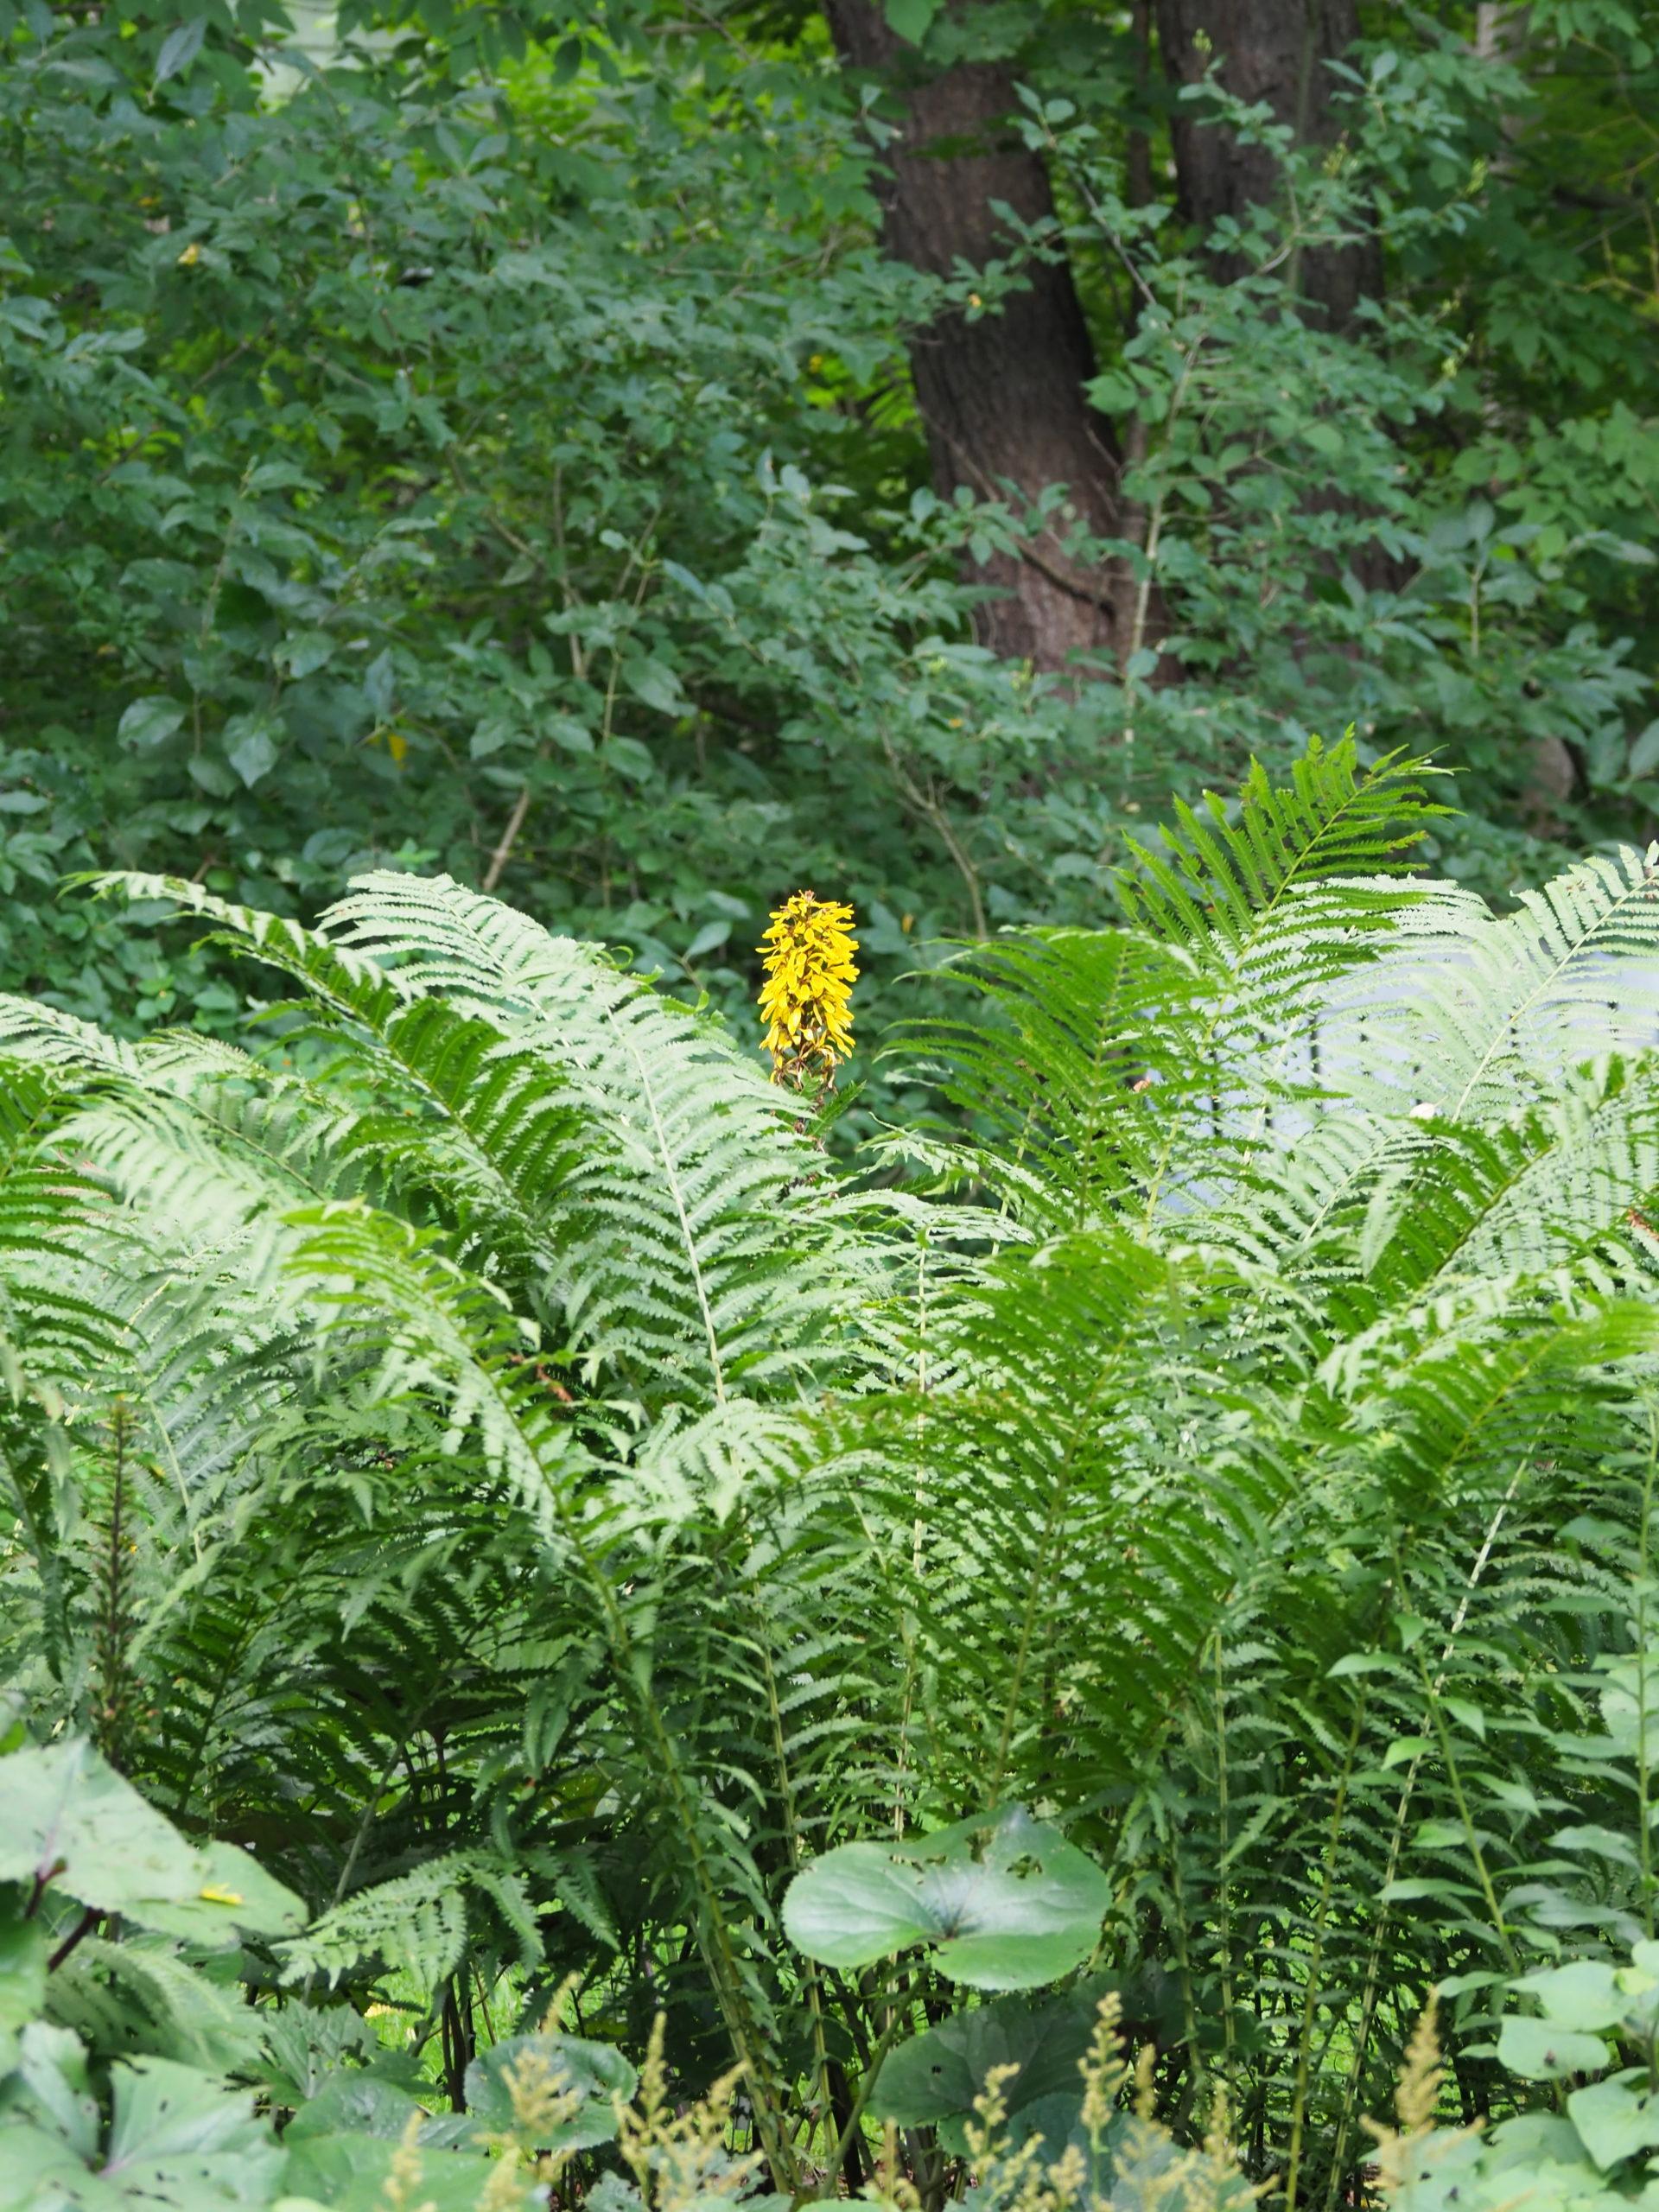 A late flowering Ligularia peeks through foliage of Ostrich ferns.